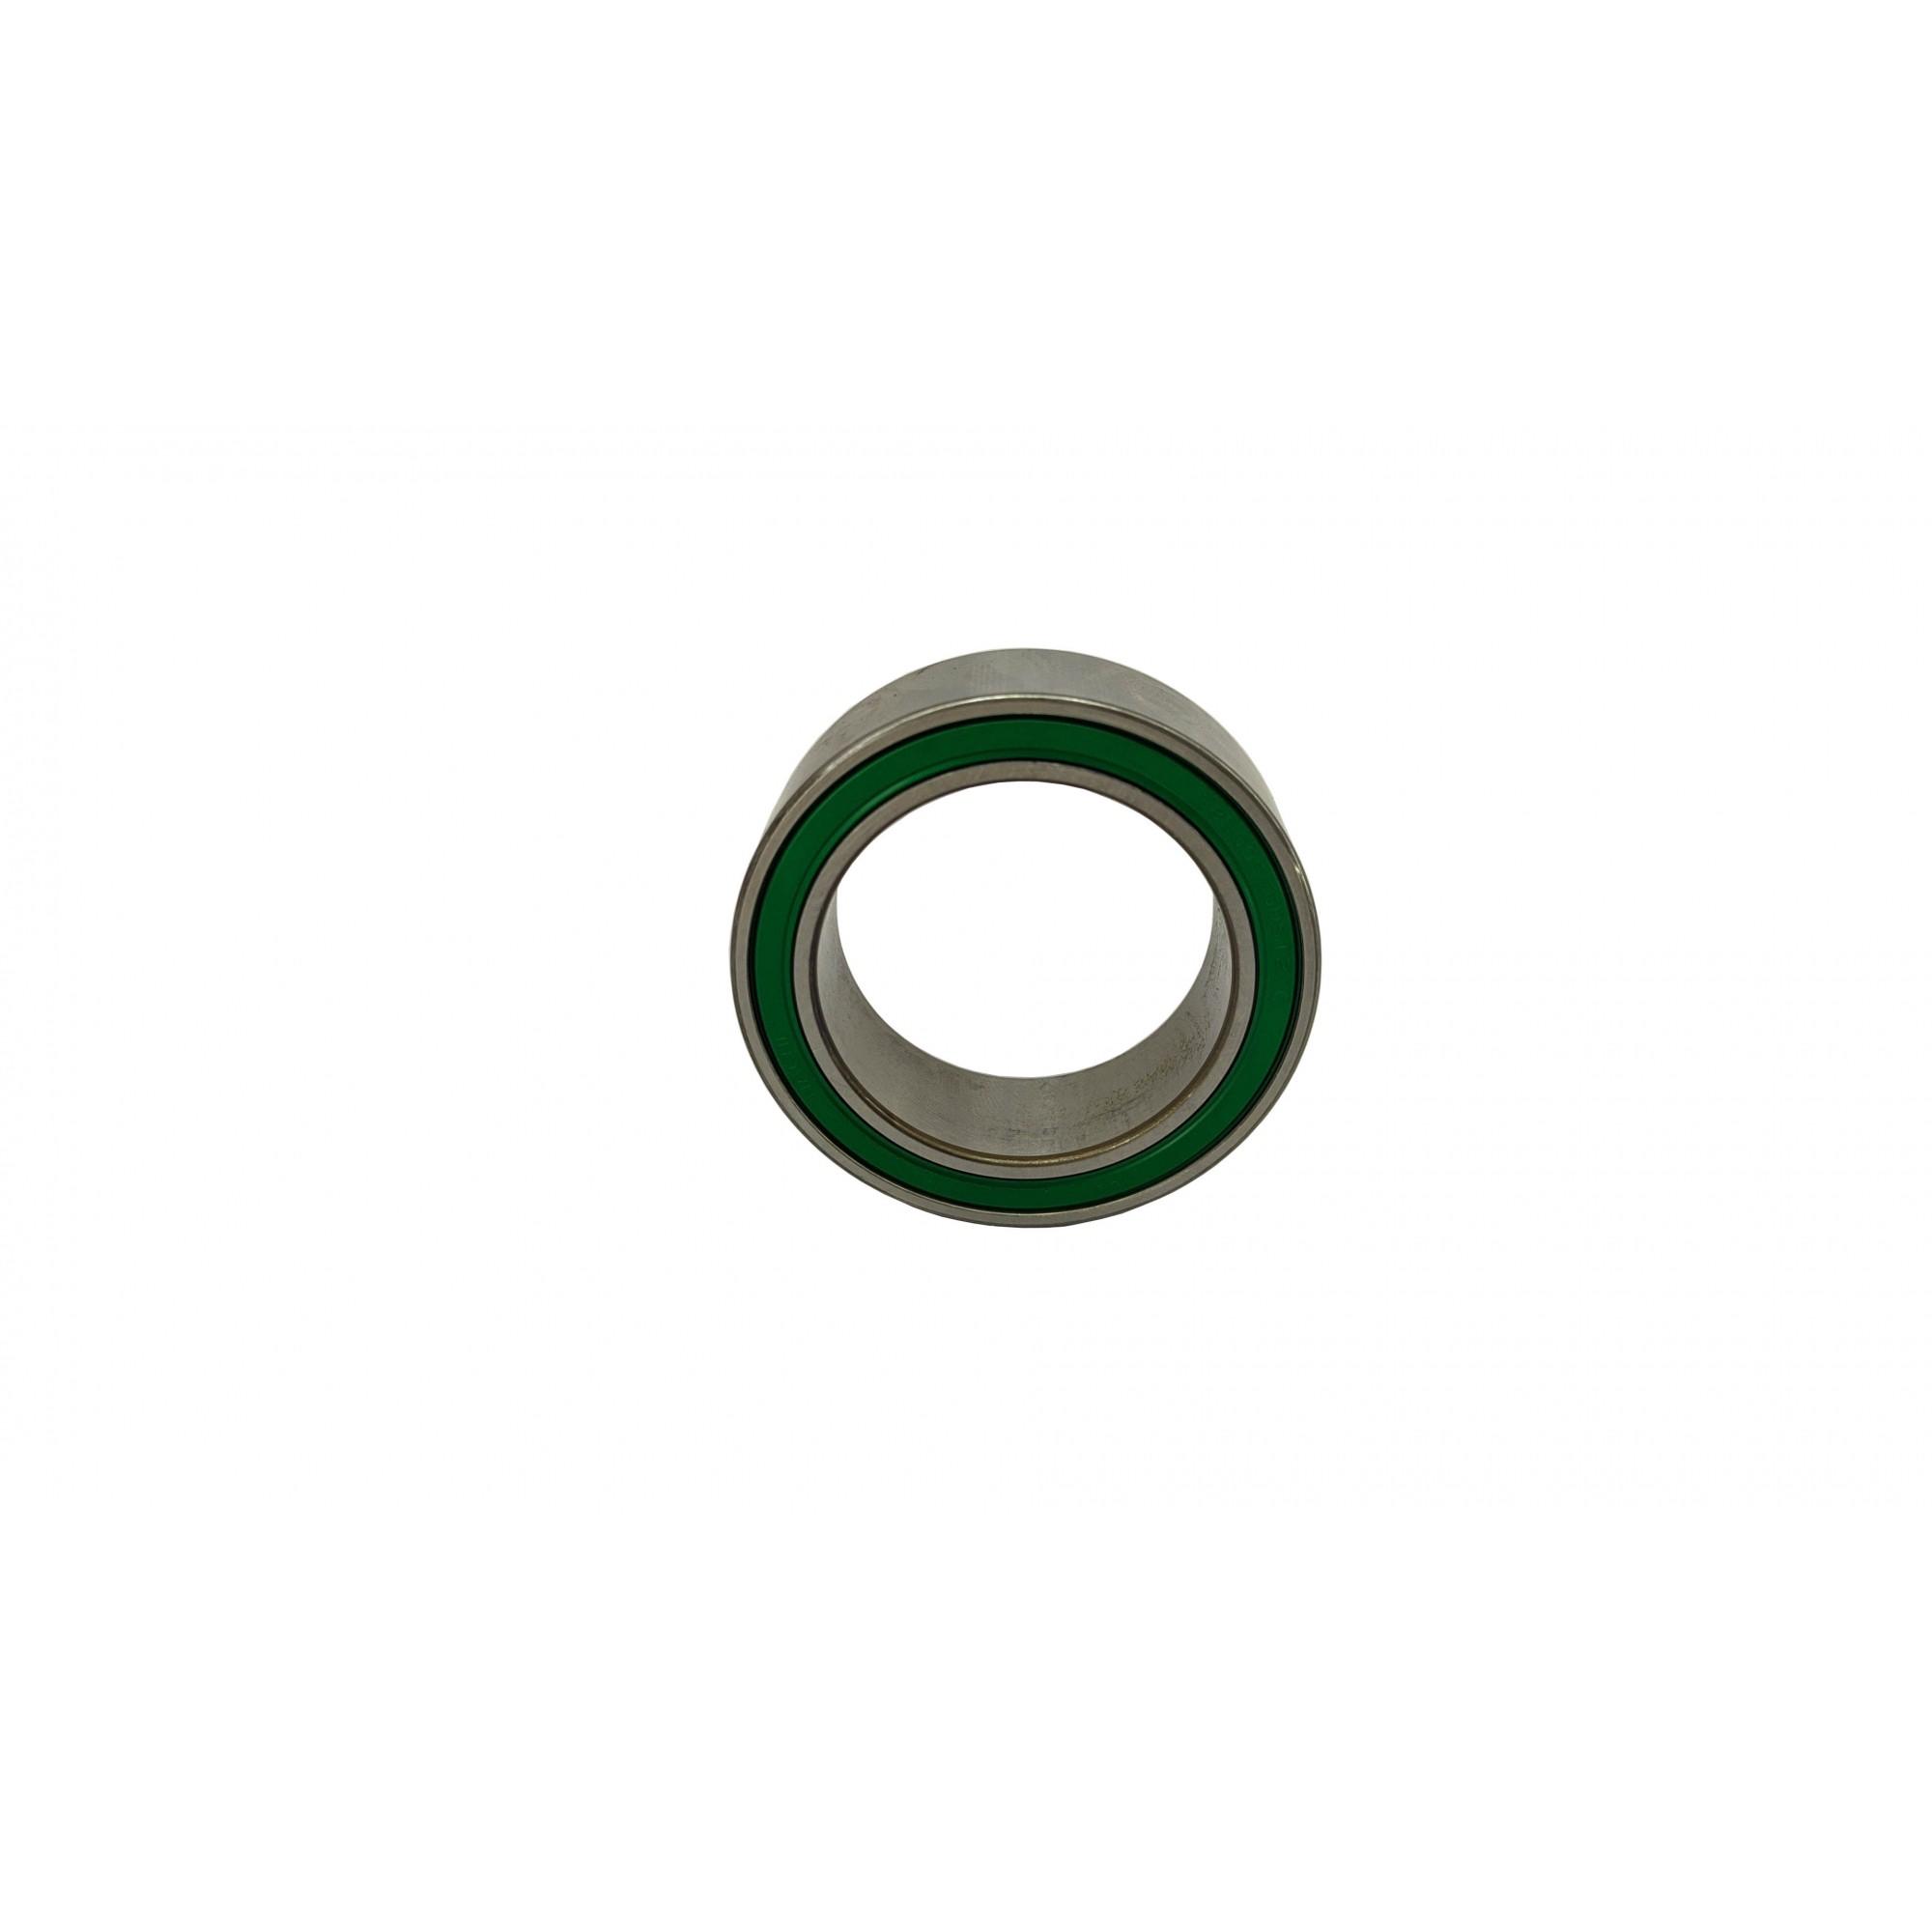 Rolamento Compressor Denso 10p08e 38x54x17mm